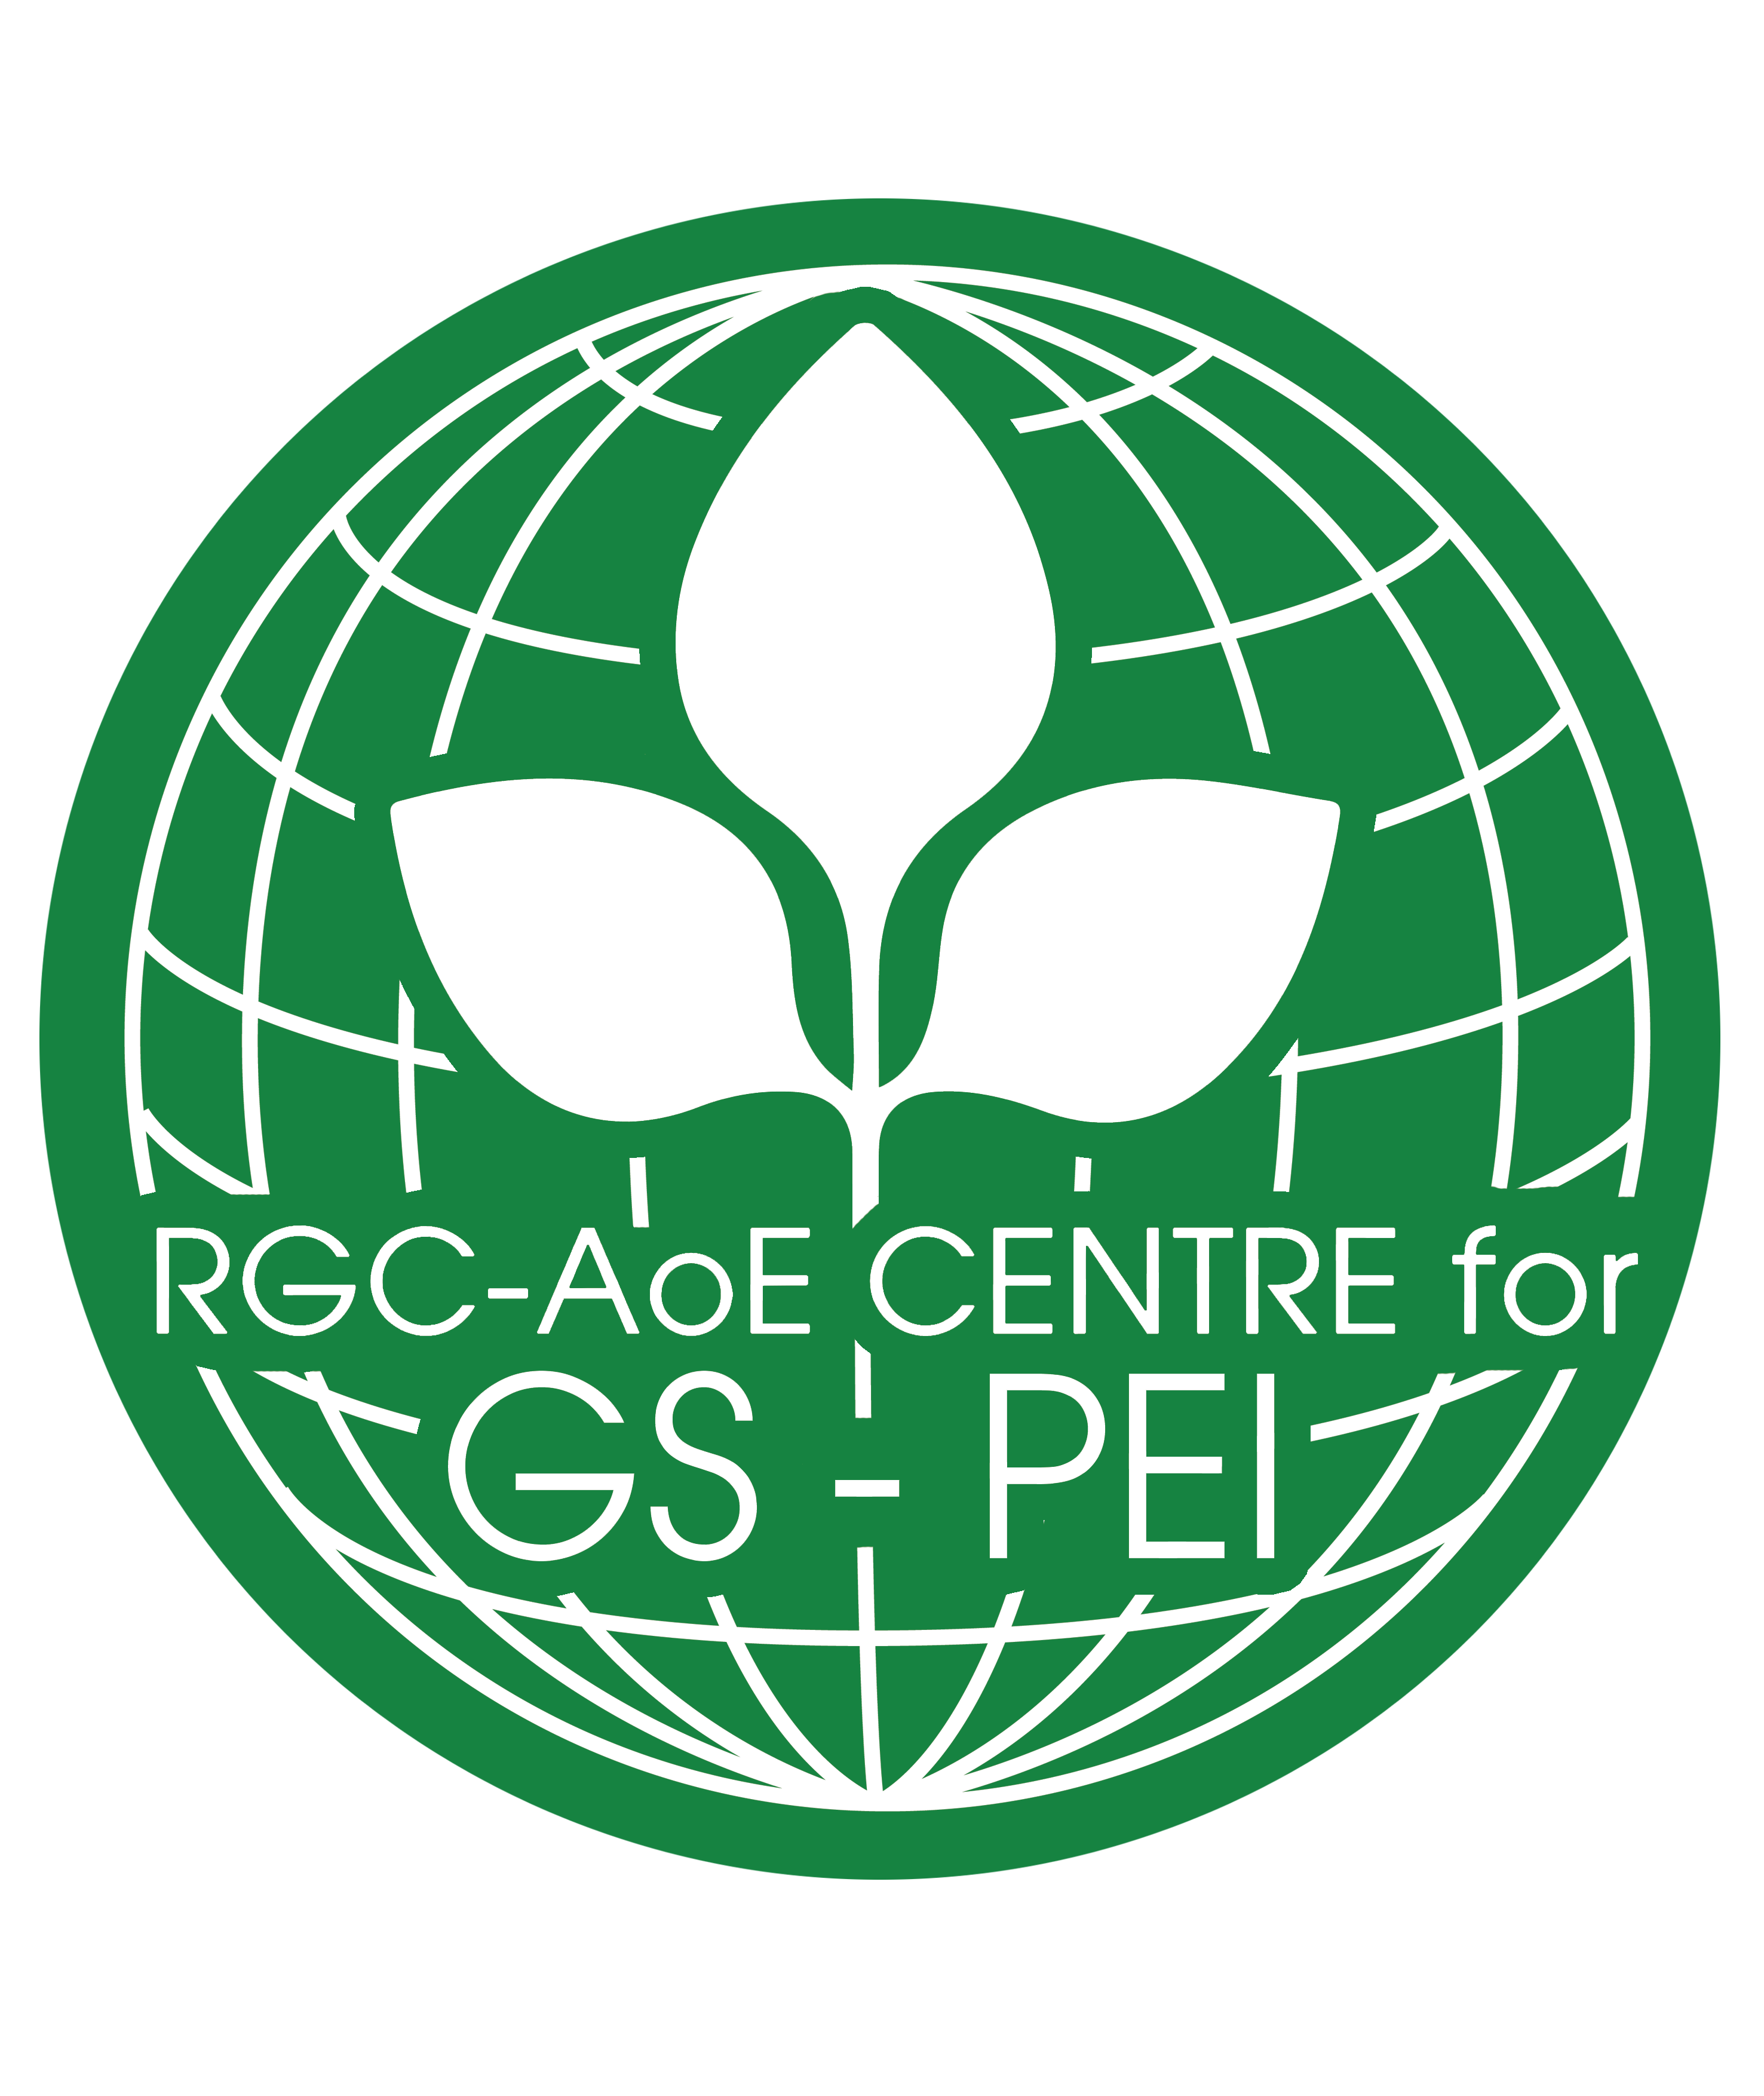 AoE GS-PEI Logo